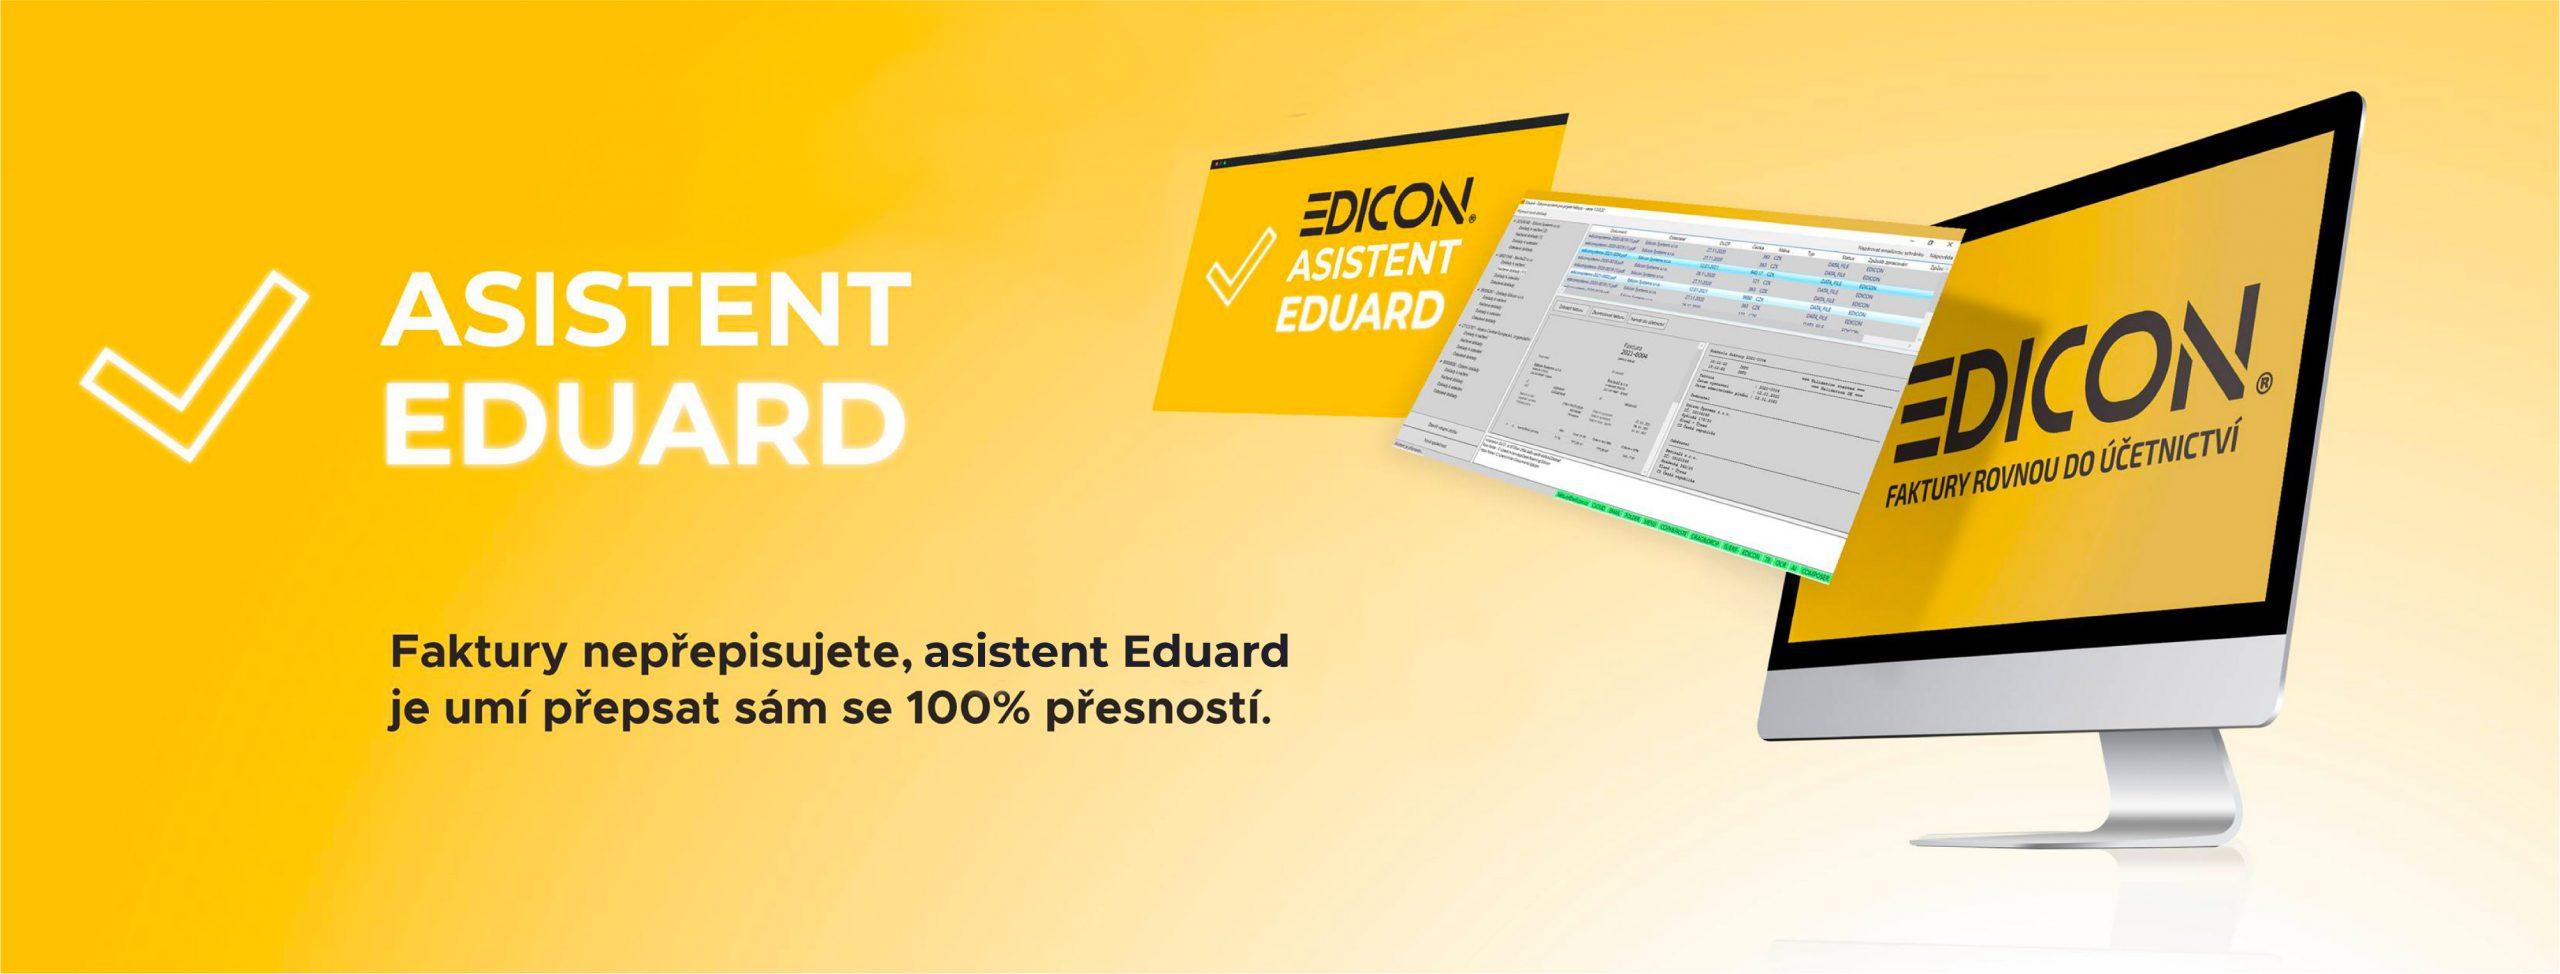 https://www.edicon.cz/wp-content/uploads/2021/10/ediconbanne-01-scaled.jpg